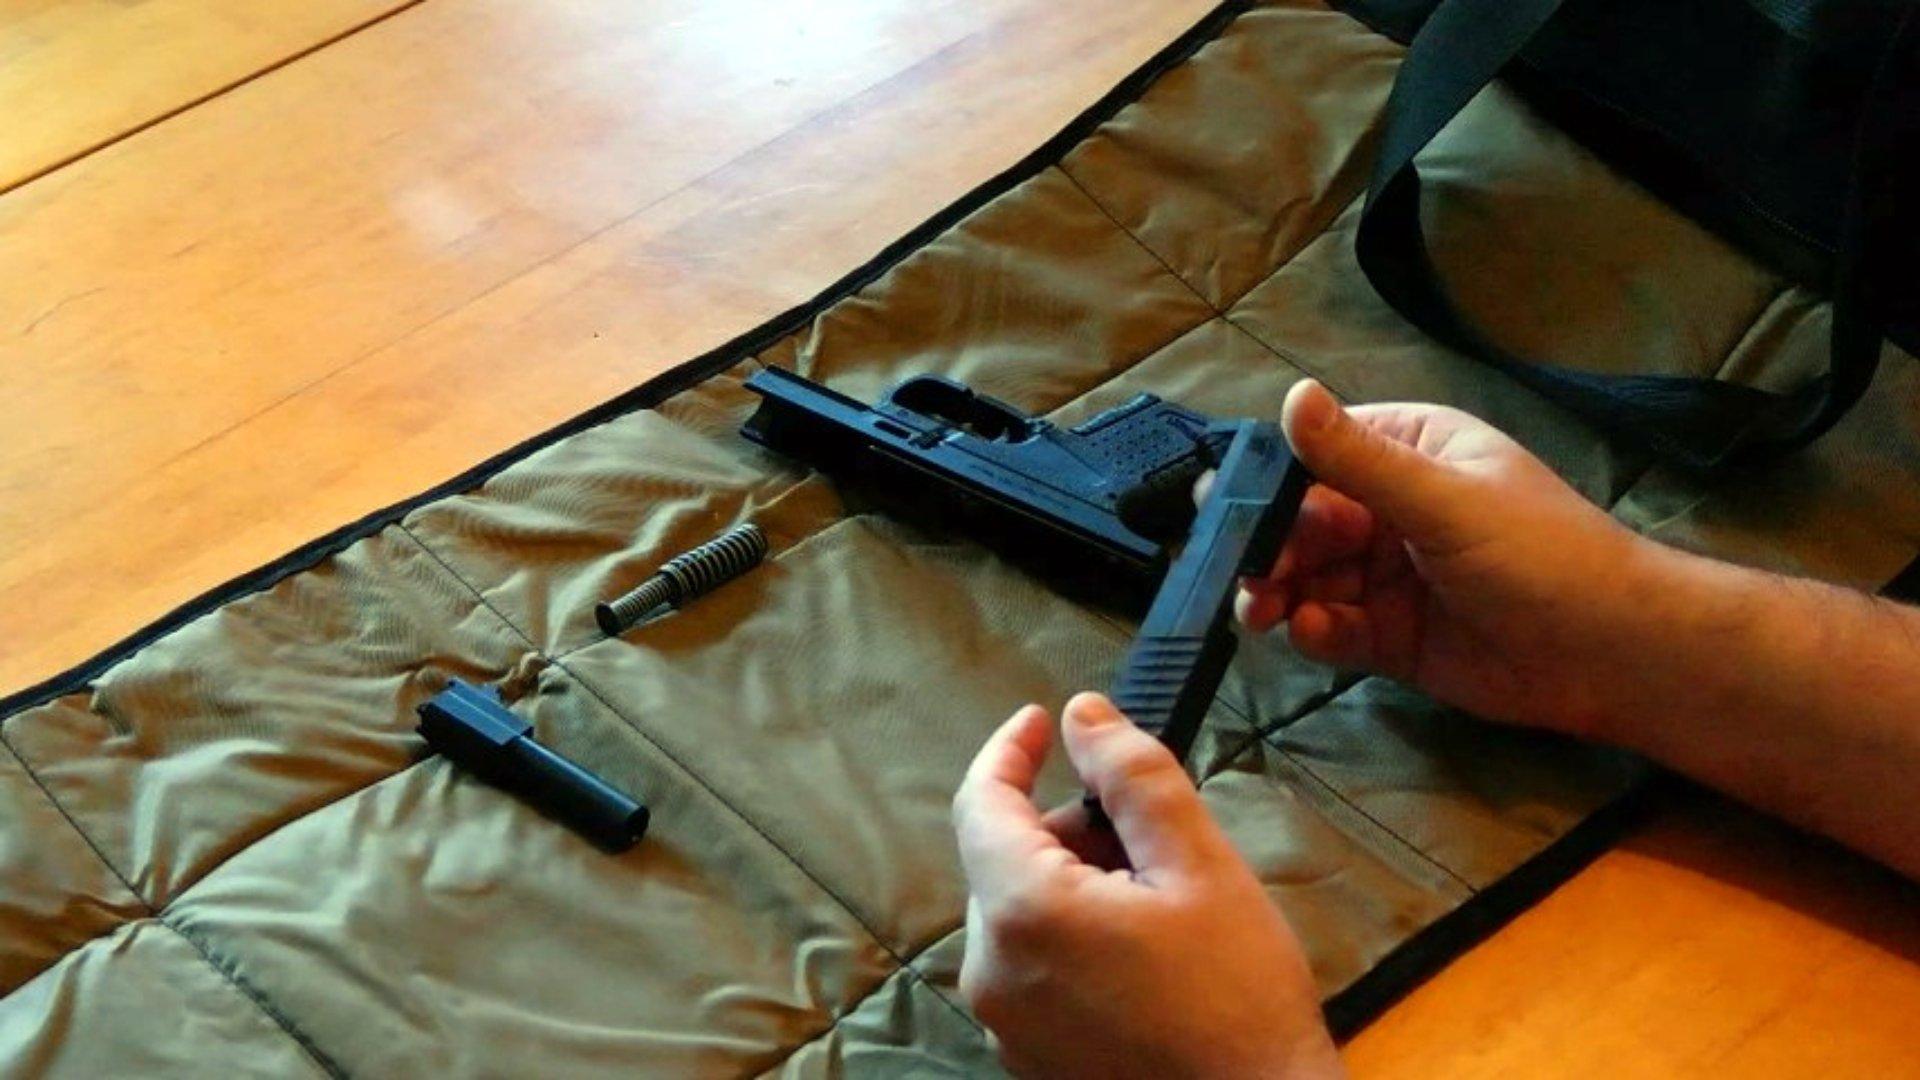 Beretta M9 Diagram Beretta 92 Firing Pin Spring Replacement Beretta